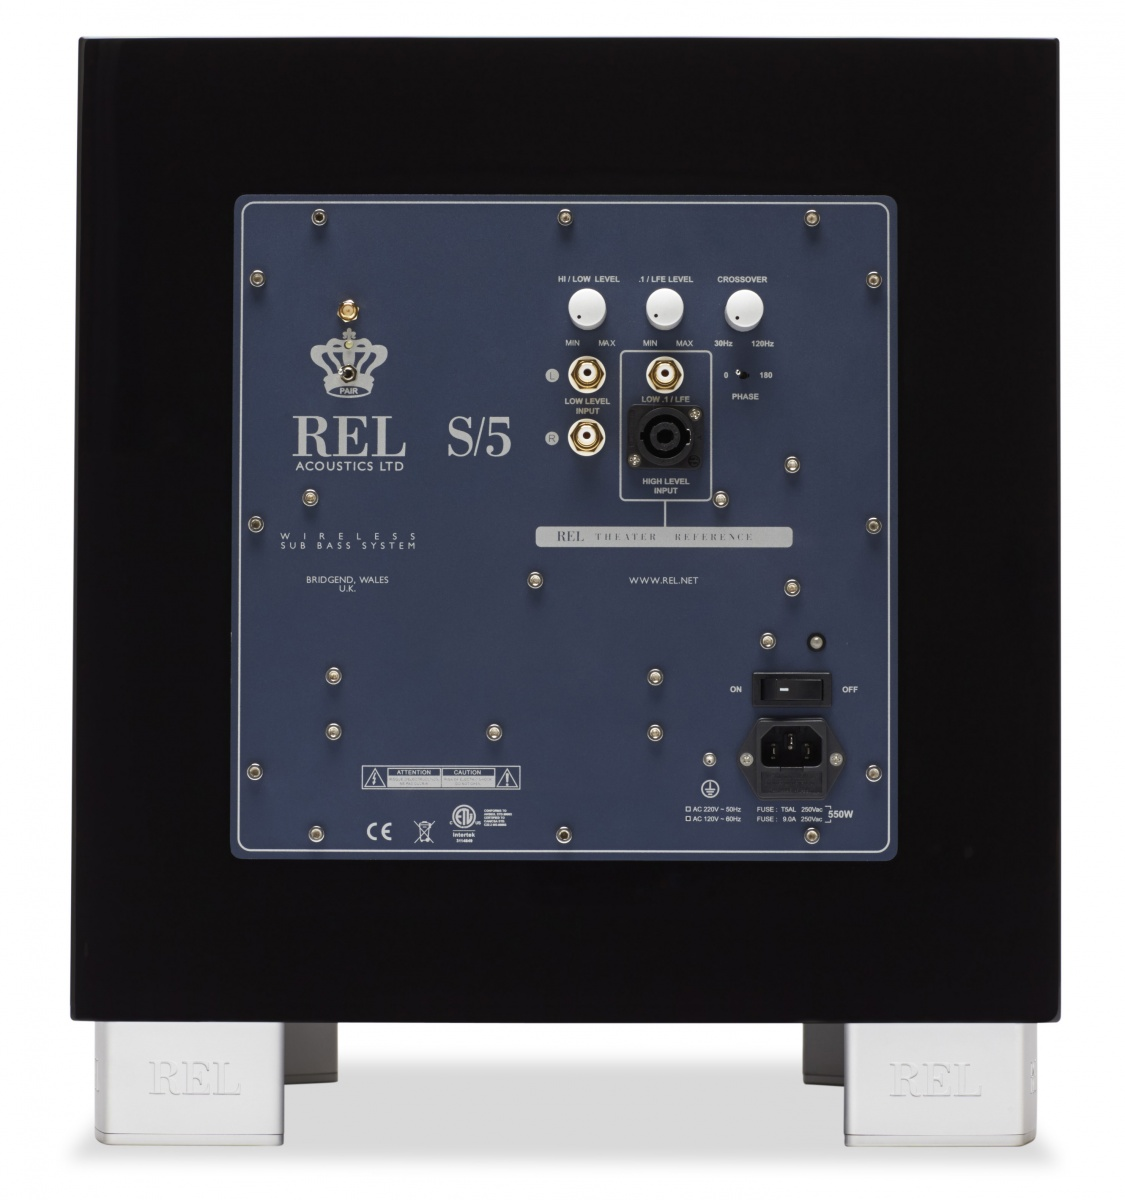 REL S 5 - Subwoofer 550W/20Hz, Audio Visual Factory